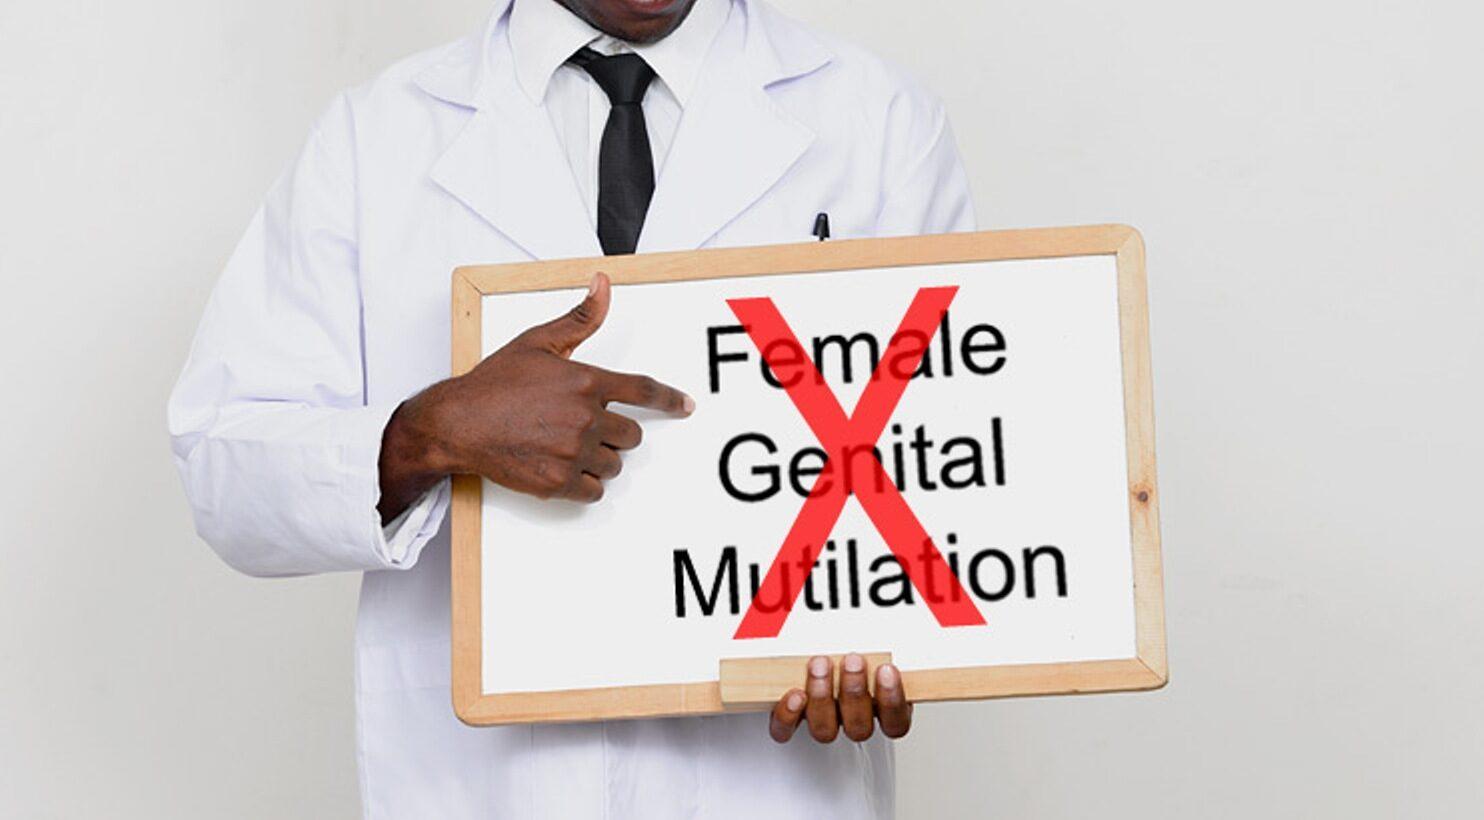 Ebonyi State ranks third in Female Genital Mutilation practice - Vanguard